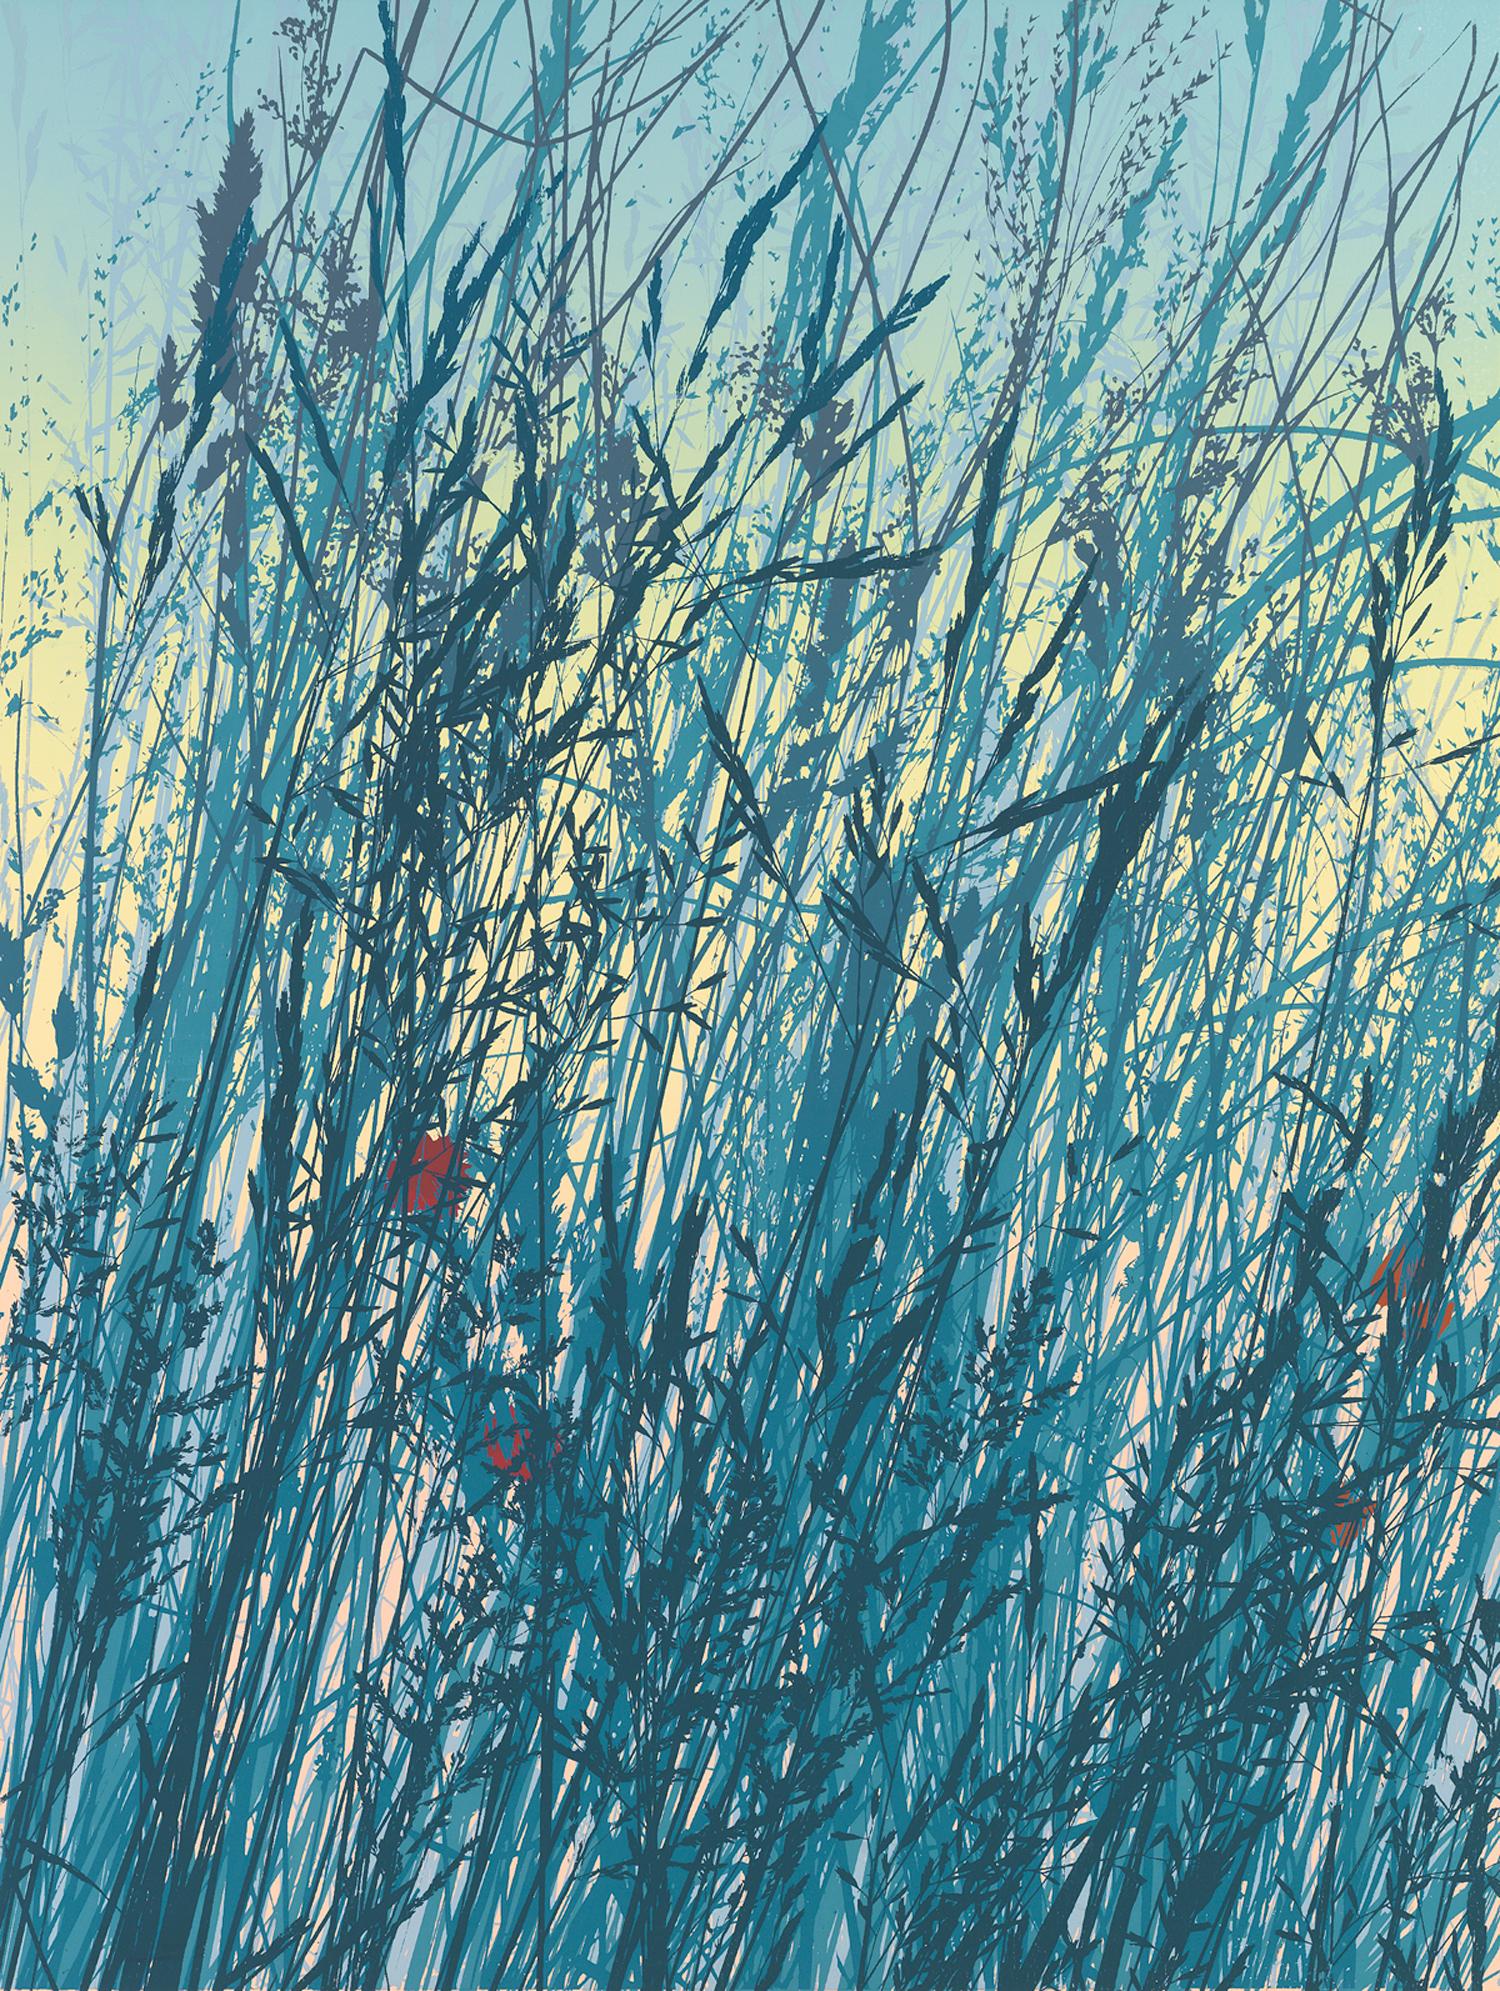 Blue Grasses